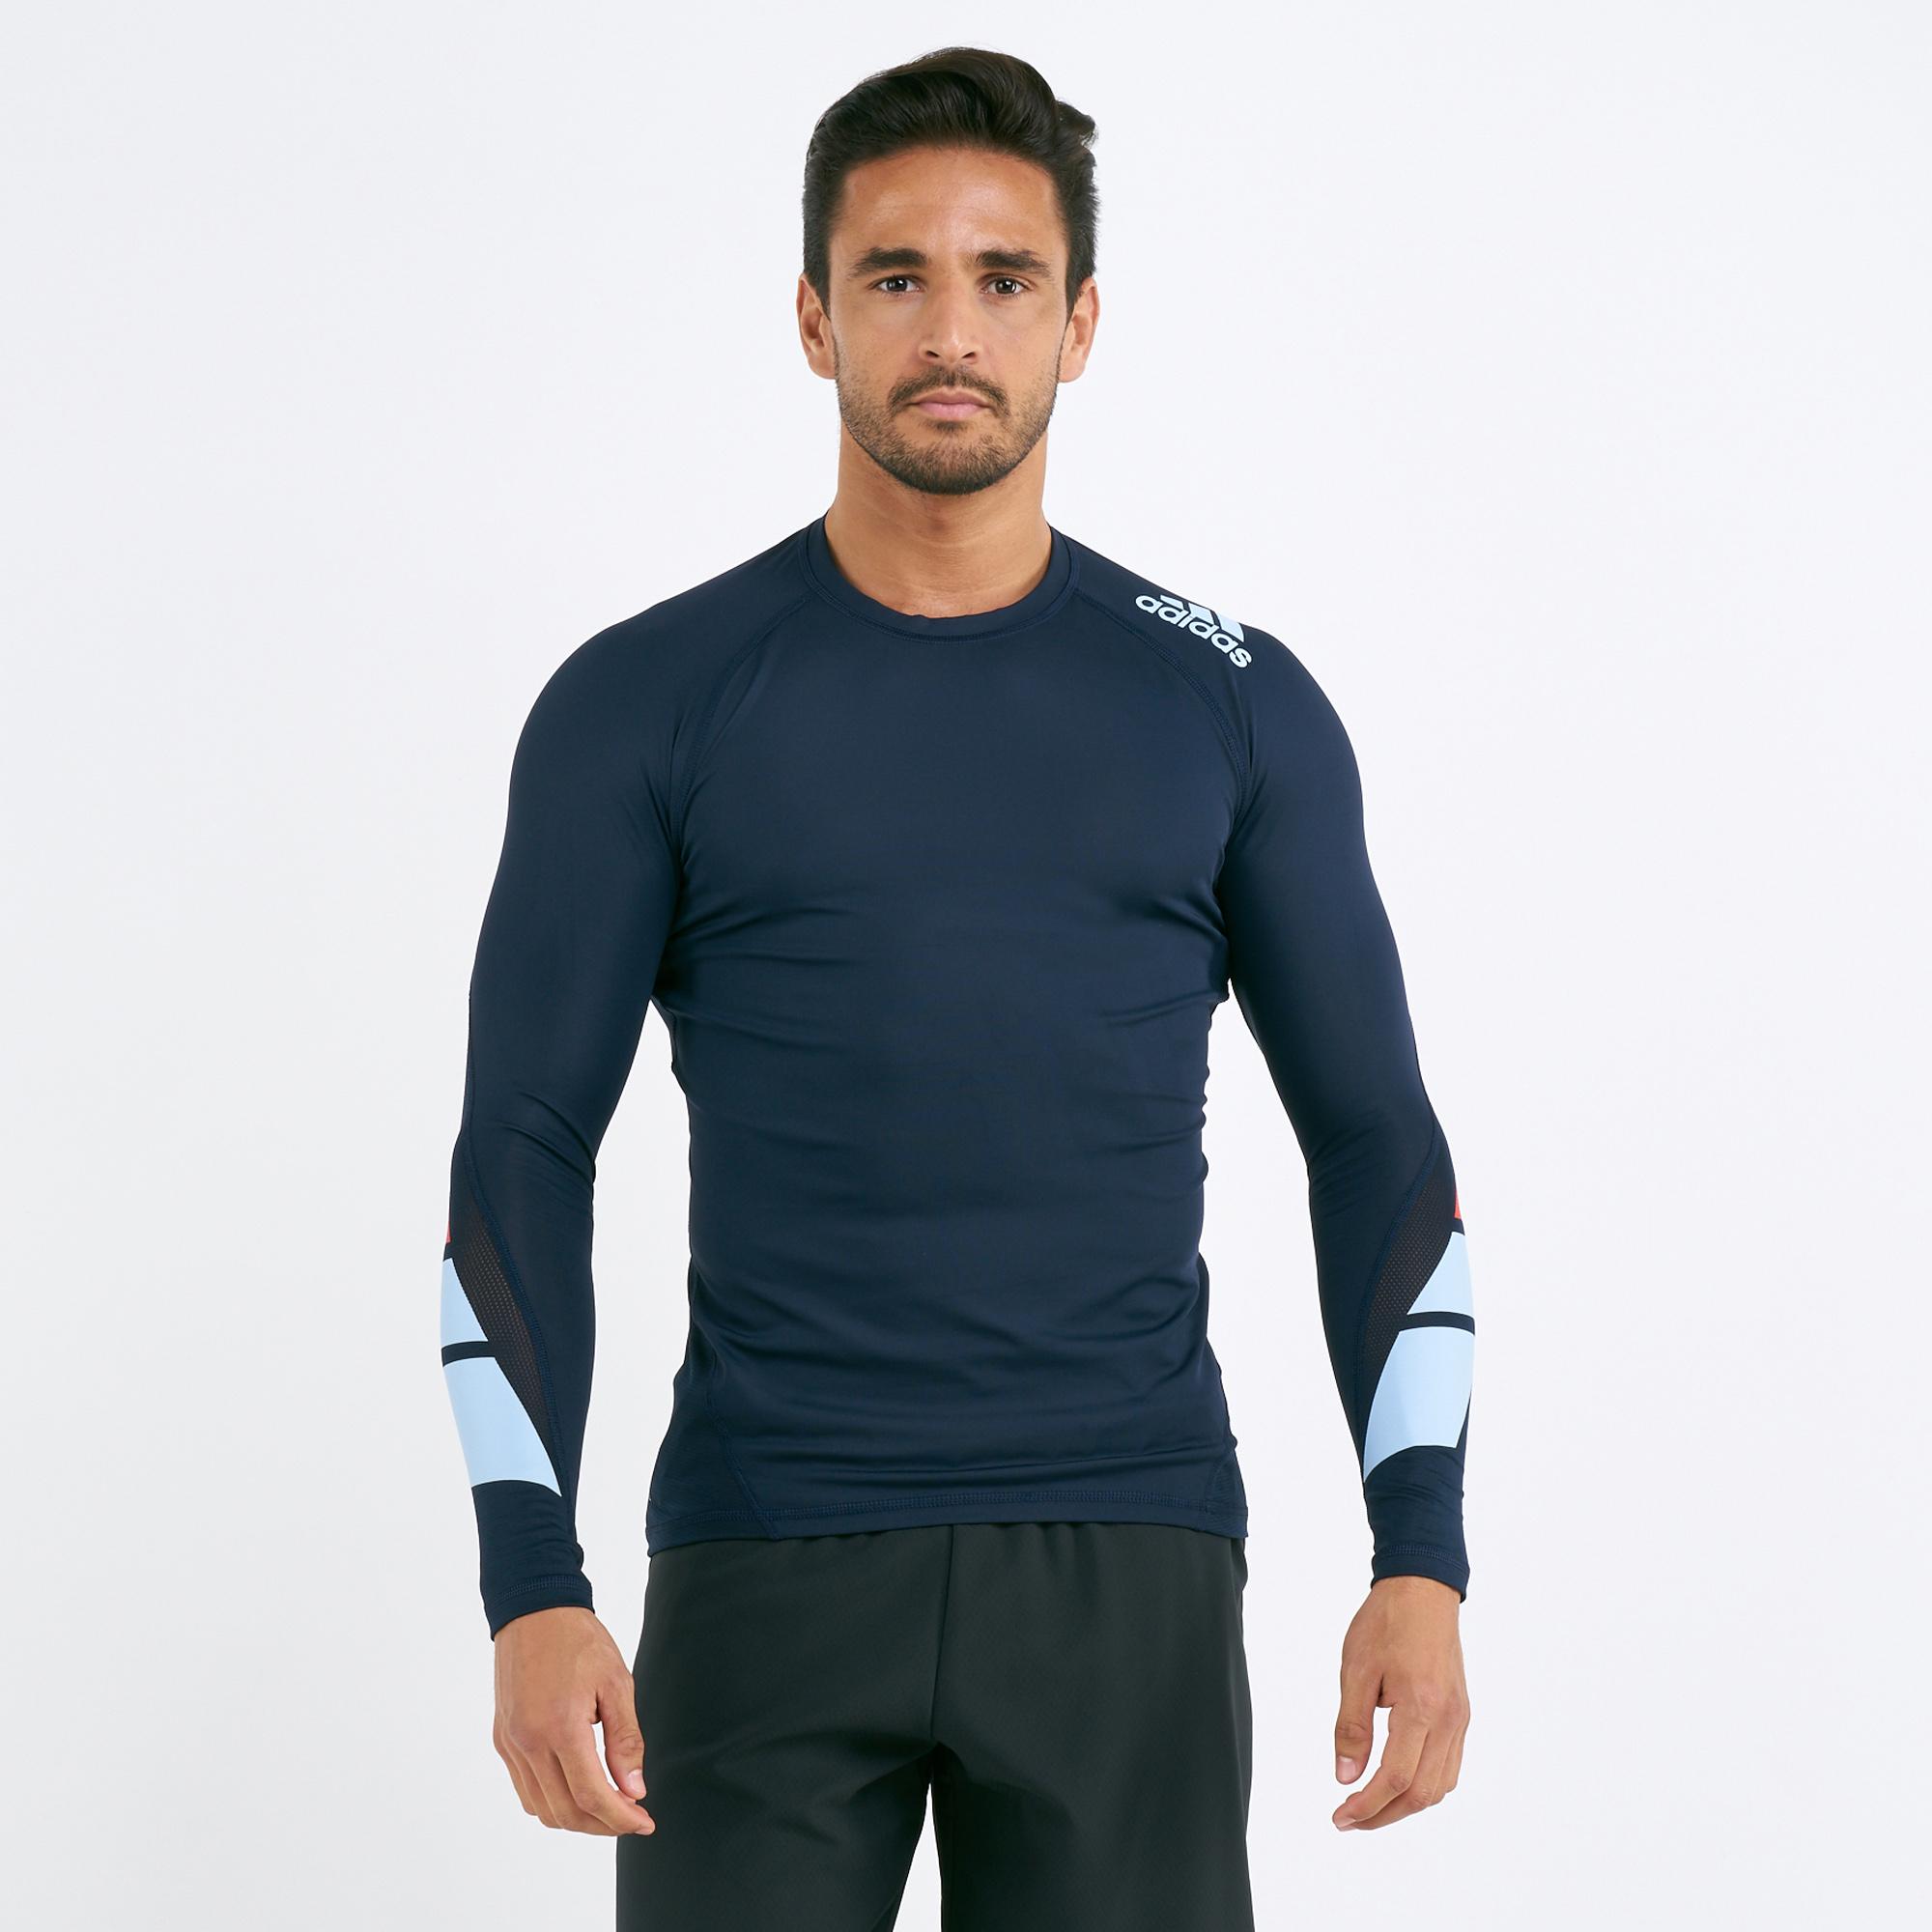 cbc8832f adidas Men's Moto Pack Alphaskin Long Sleeves T-shirt